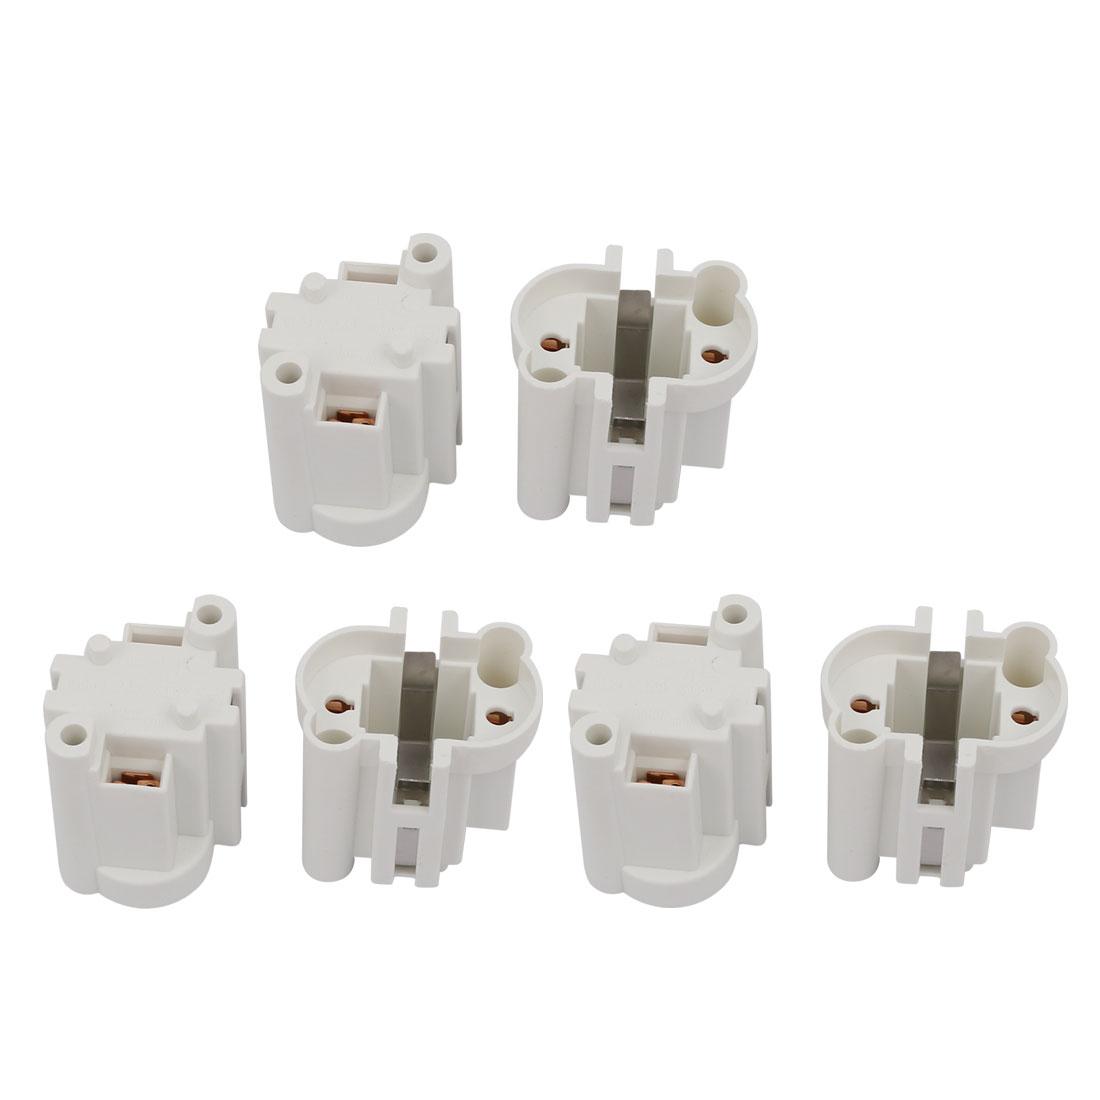 6 Pcs G23-F269 AC 500V 2A Light Socket Base Fluorescent PL Tube Lamp Holder